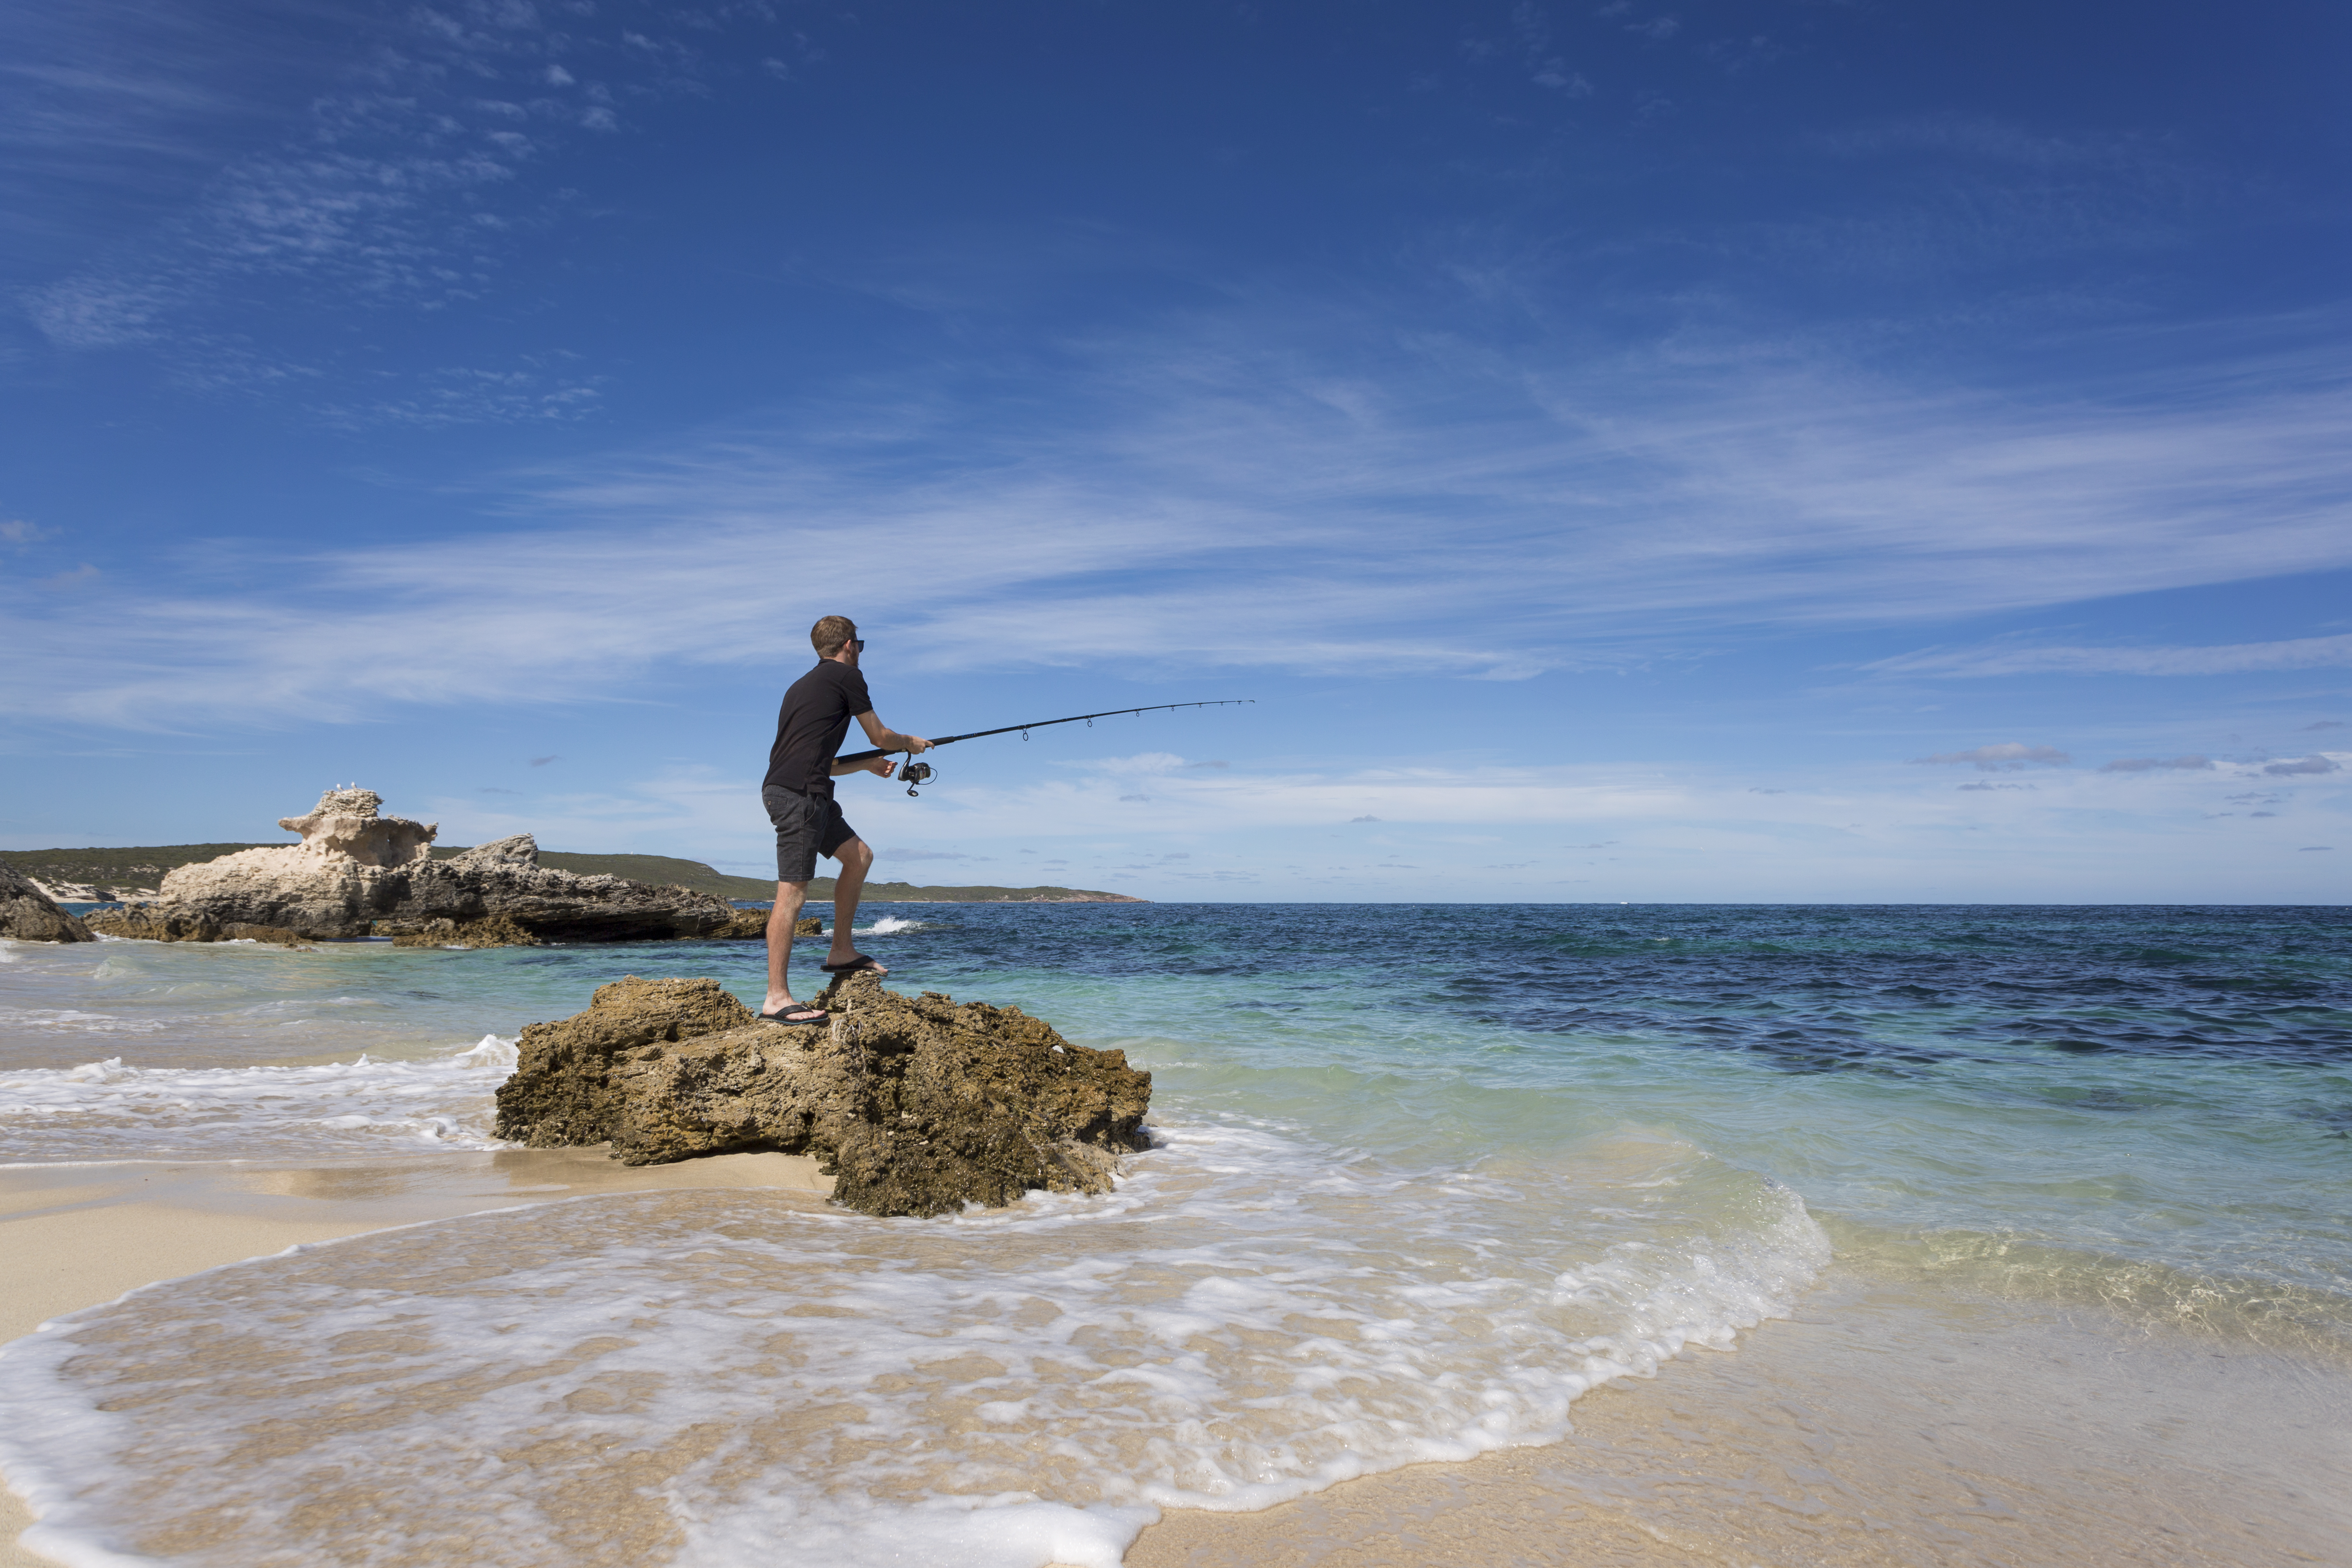 fishing-iStock-945048636